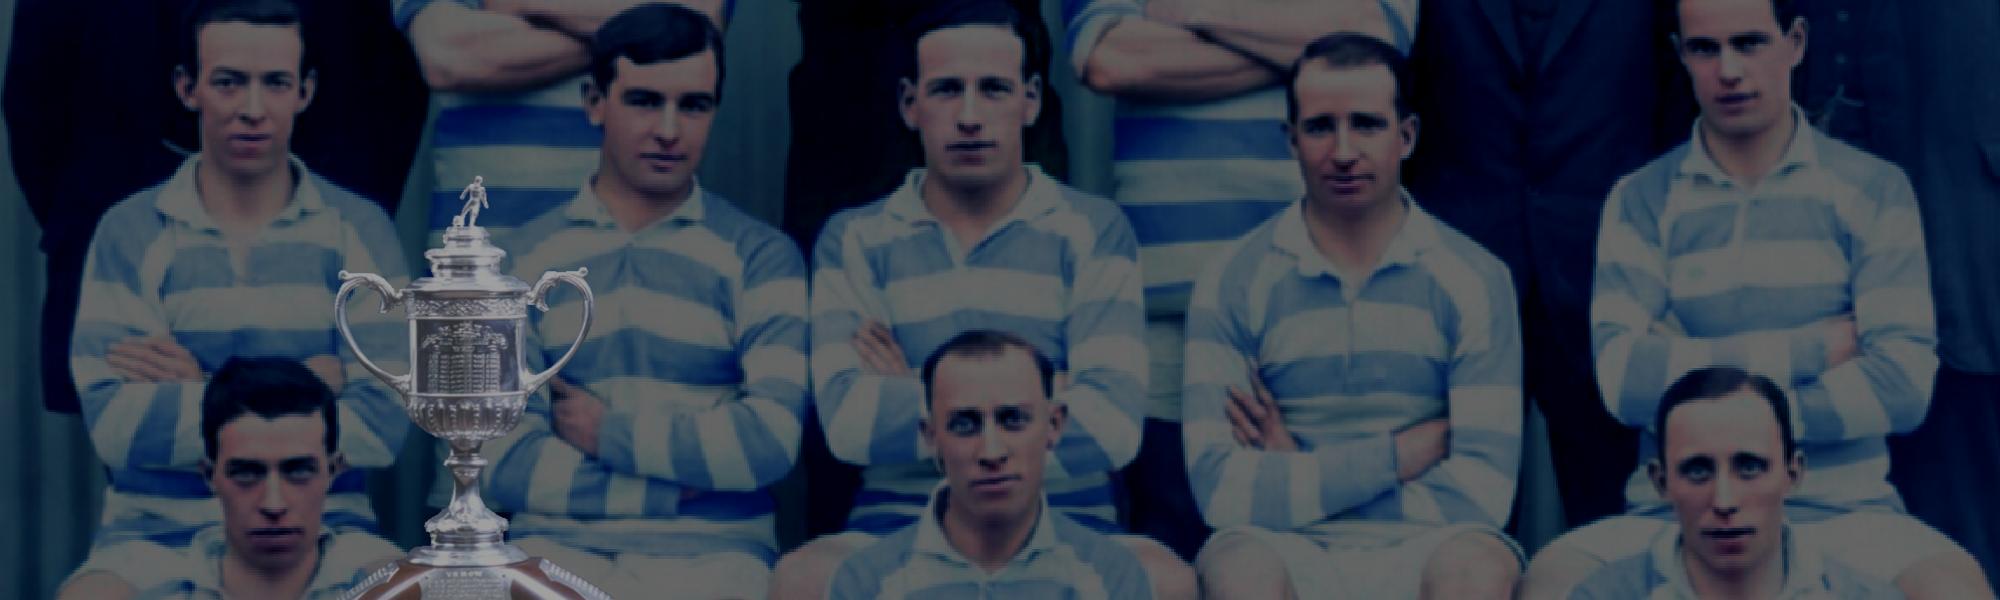 1928-29 Scottish Cup Winners